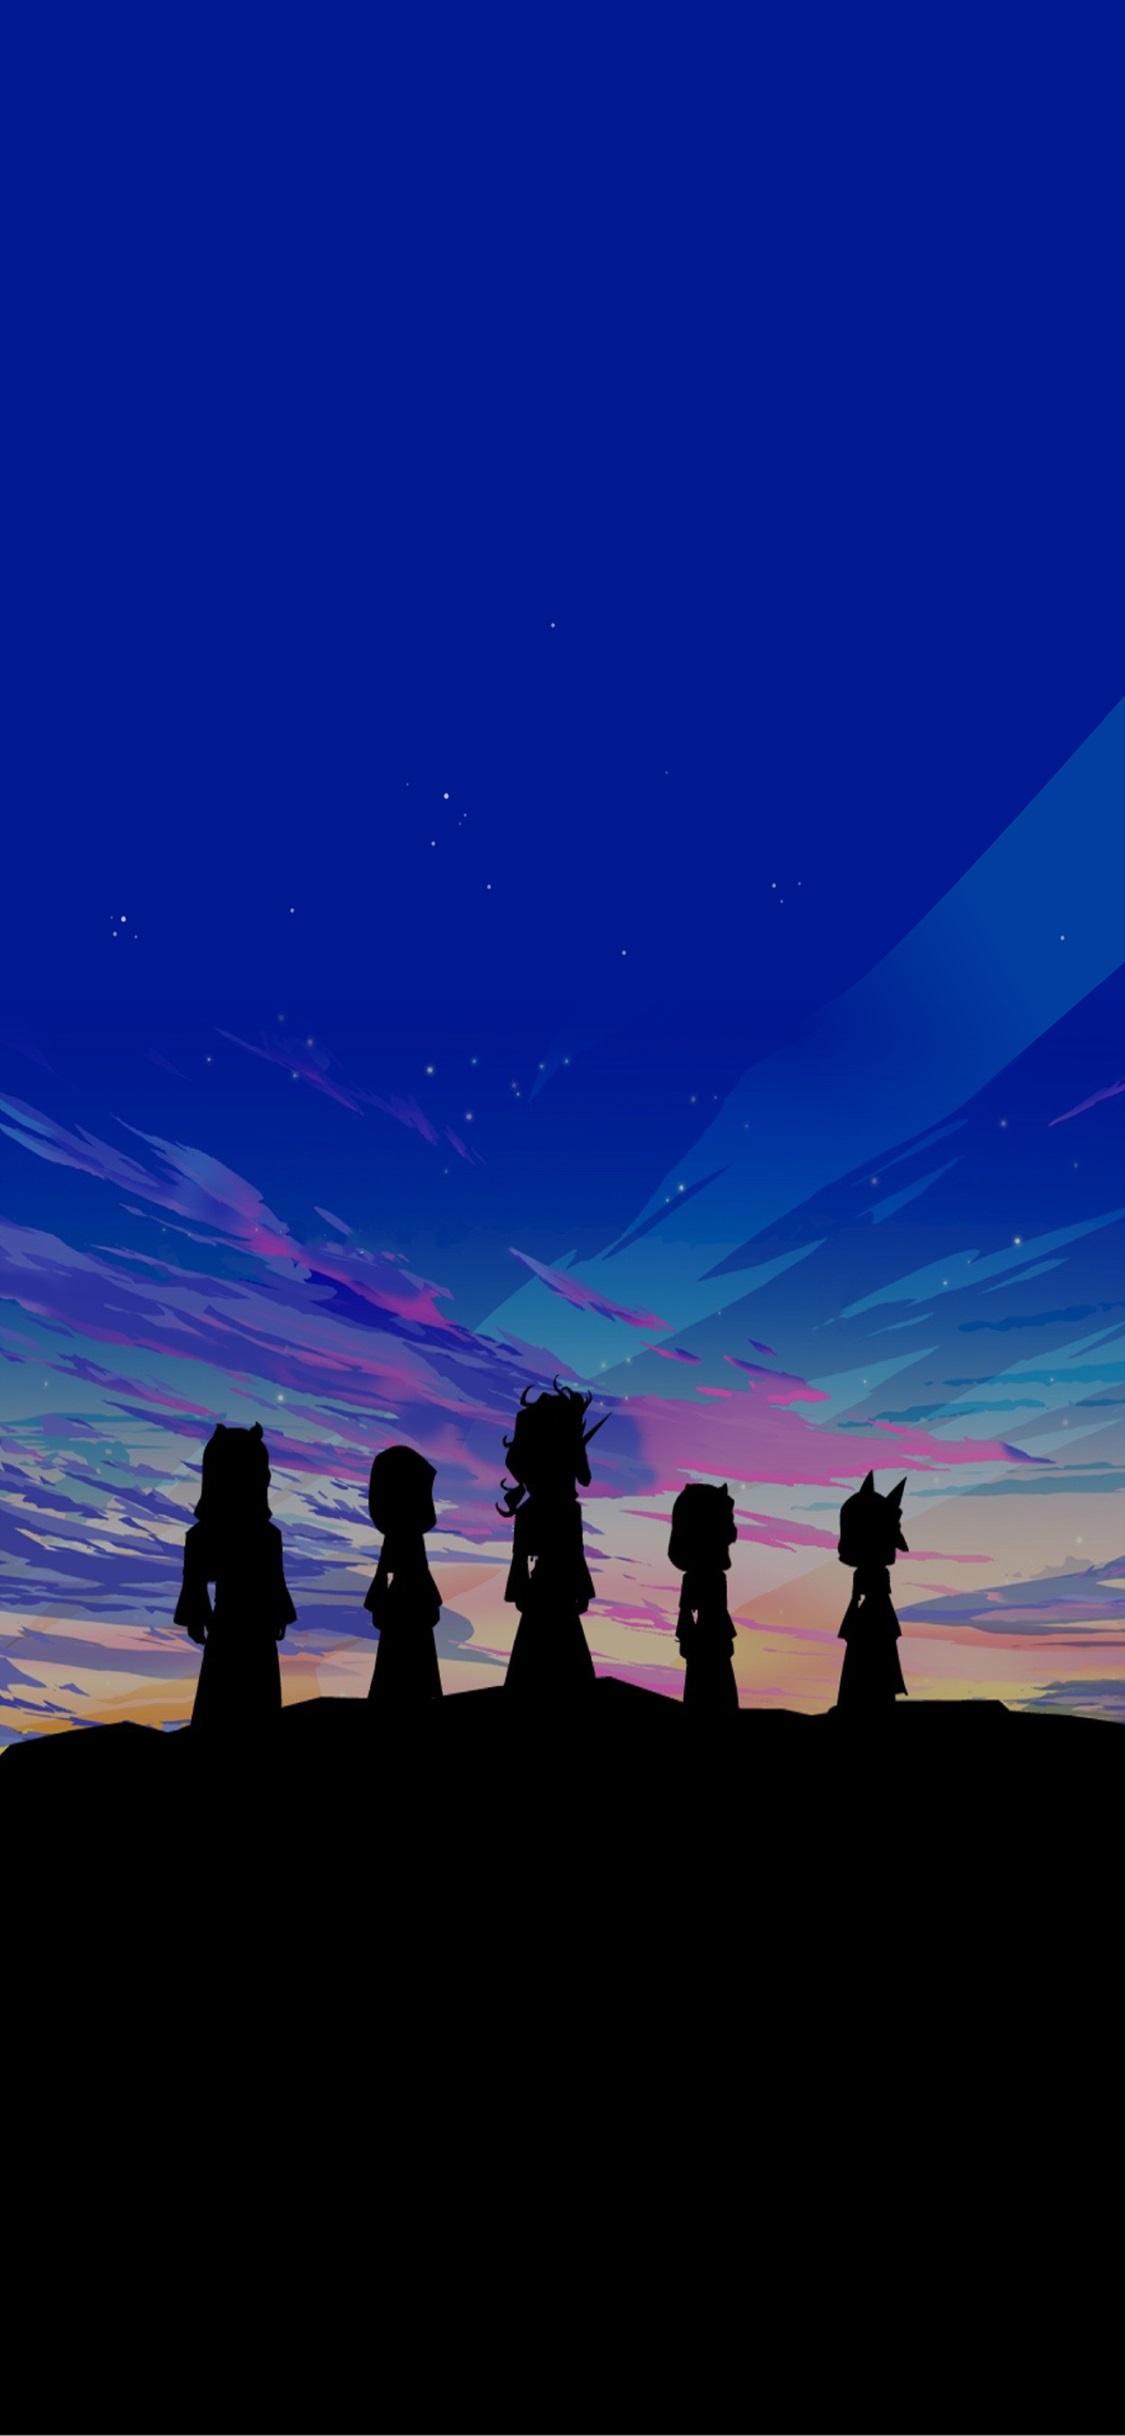 Kingdom Hearts Aqua Iphone Wallpaper ↺ - Silhouette , HD Wallpaper & Backgrounds